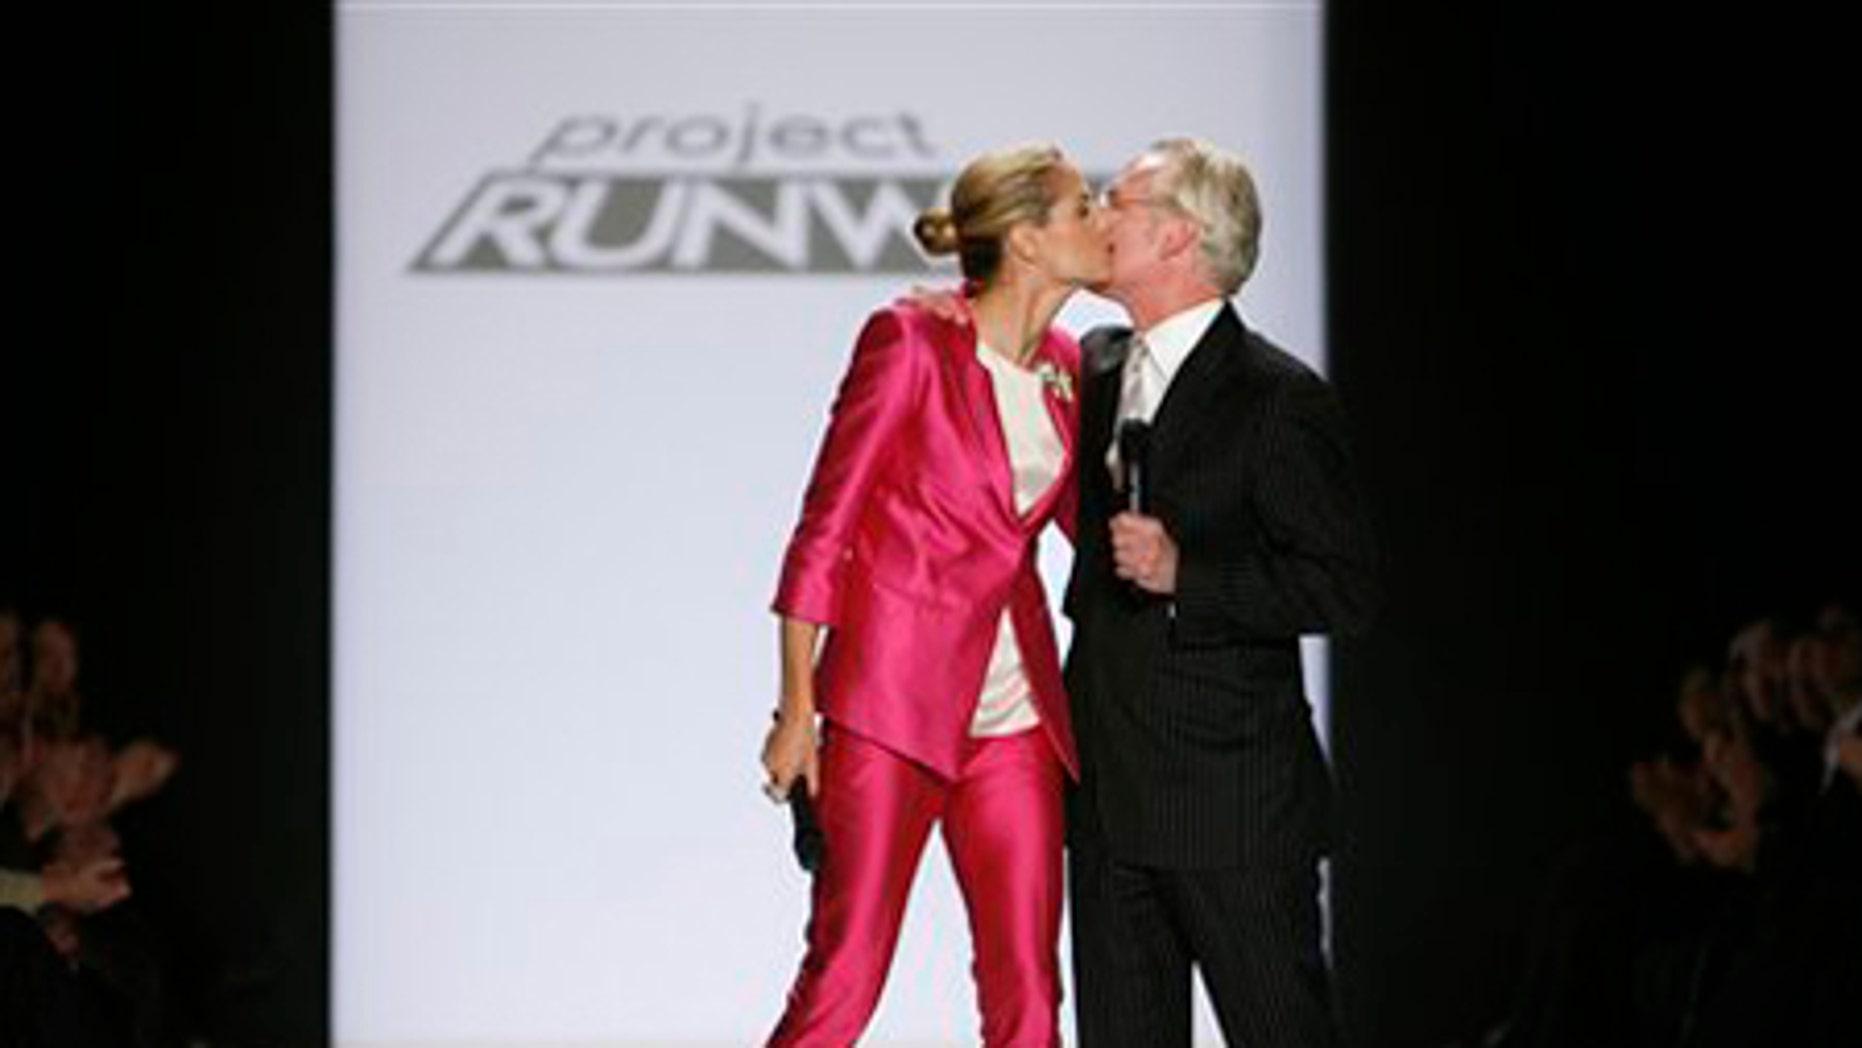 Heidi Klum and Tim Gunn kiss after the Project Runway Season 6 Finale show during Fashion Week Friday, Feb. 20, 2009 in New York.  (AP Photo/Jason DeCrow)